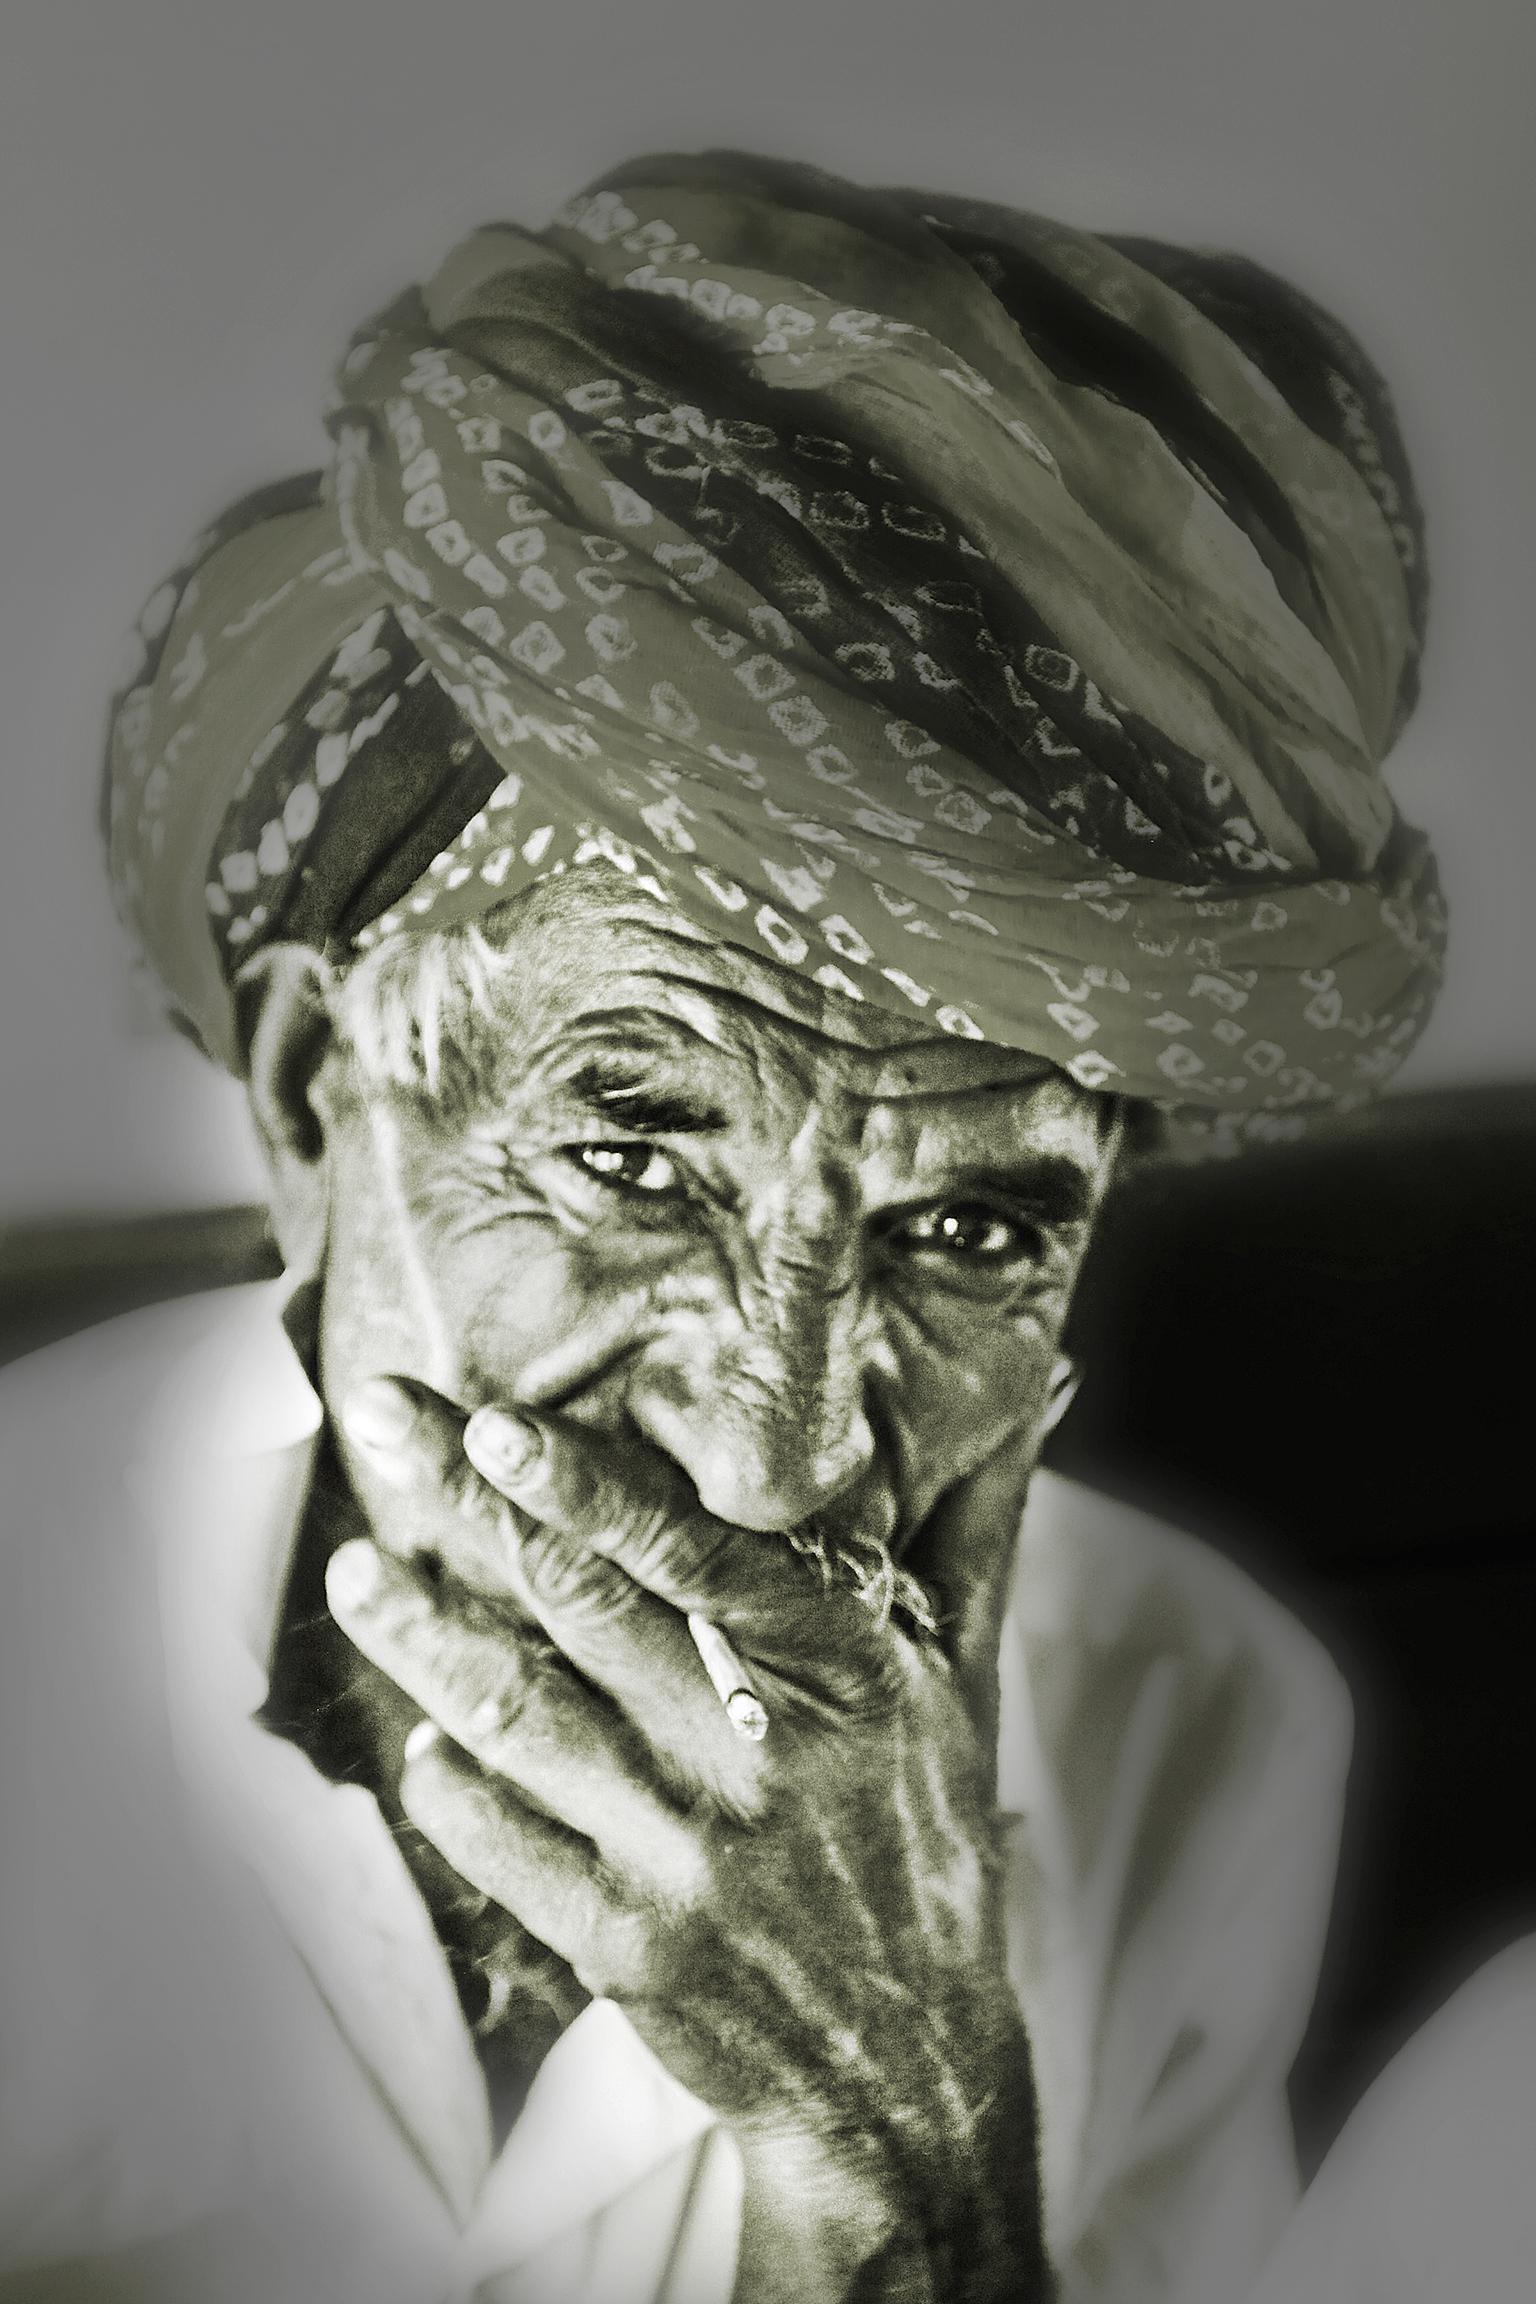 portraits-indien-inde-rajasthan-2010-marie-colette-becker-02